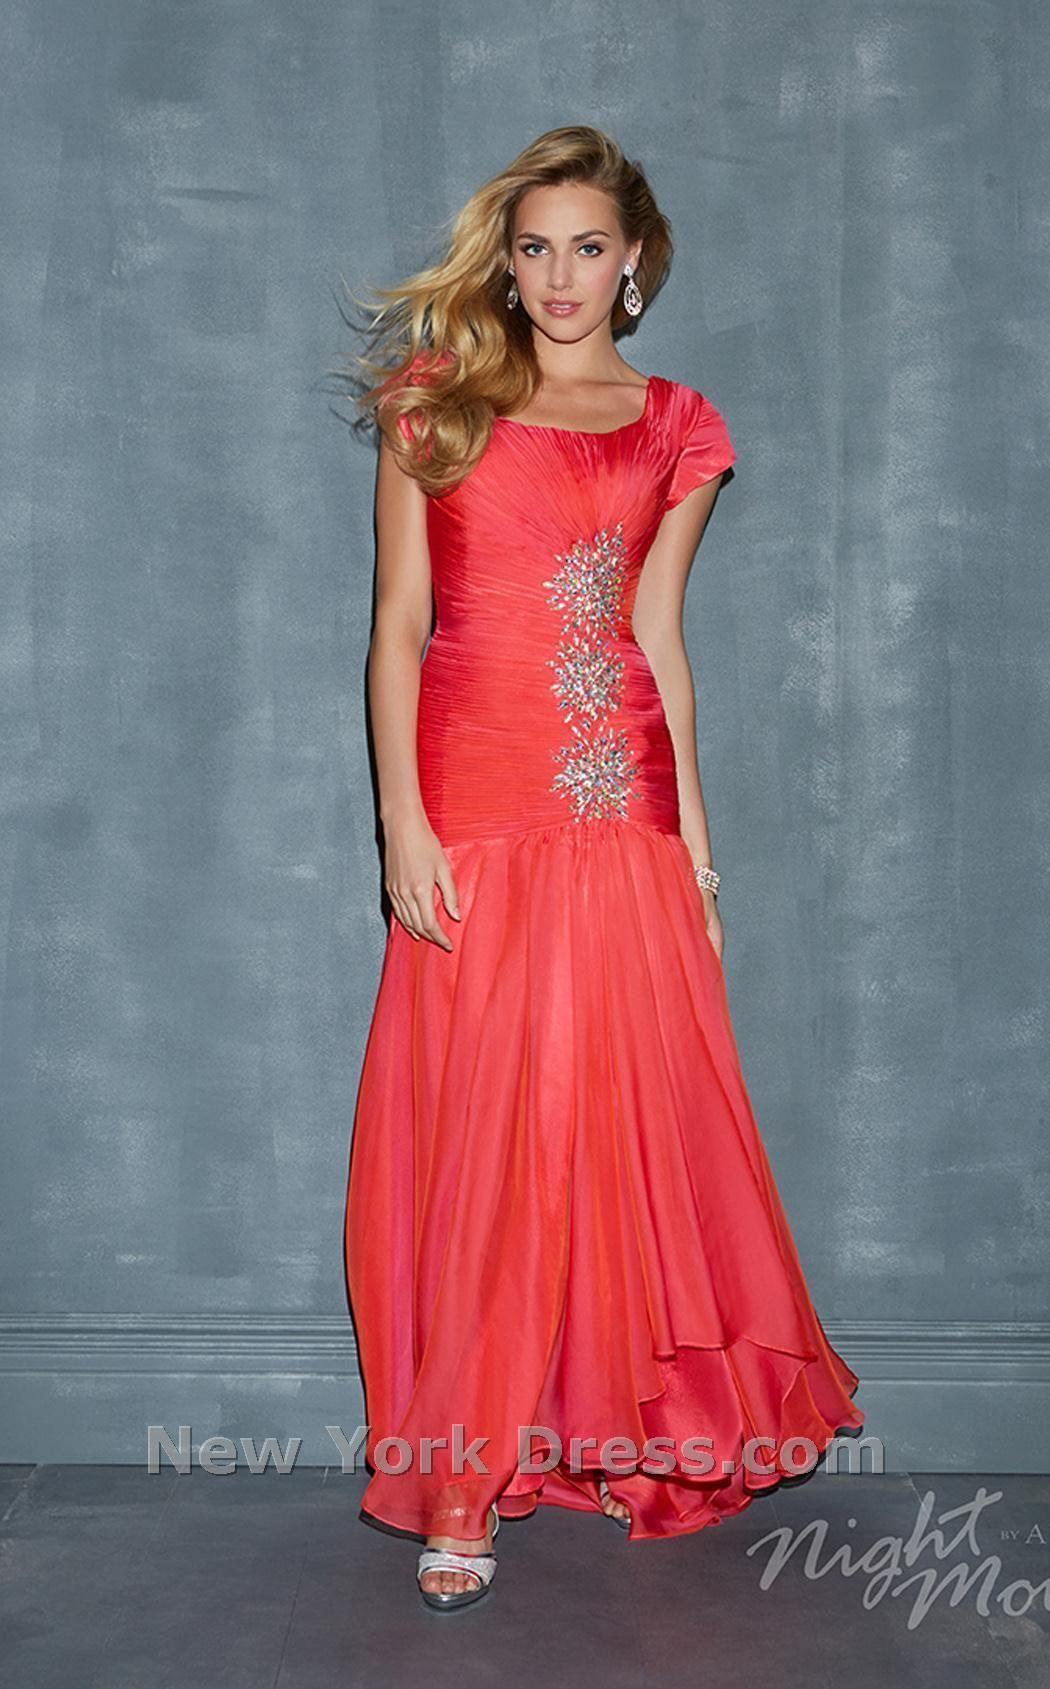 Pin by debbie warrenberry on orangalicuous pinterest dresses